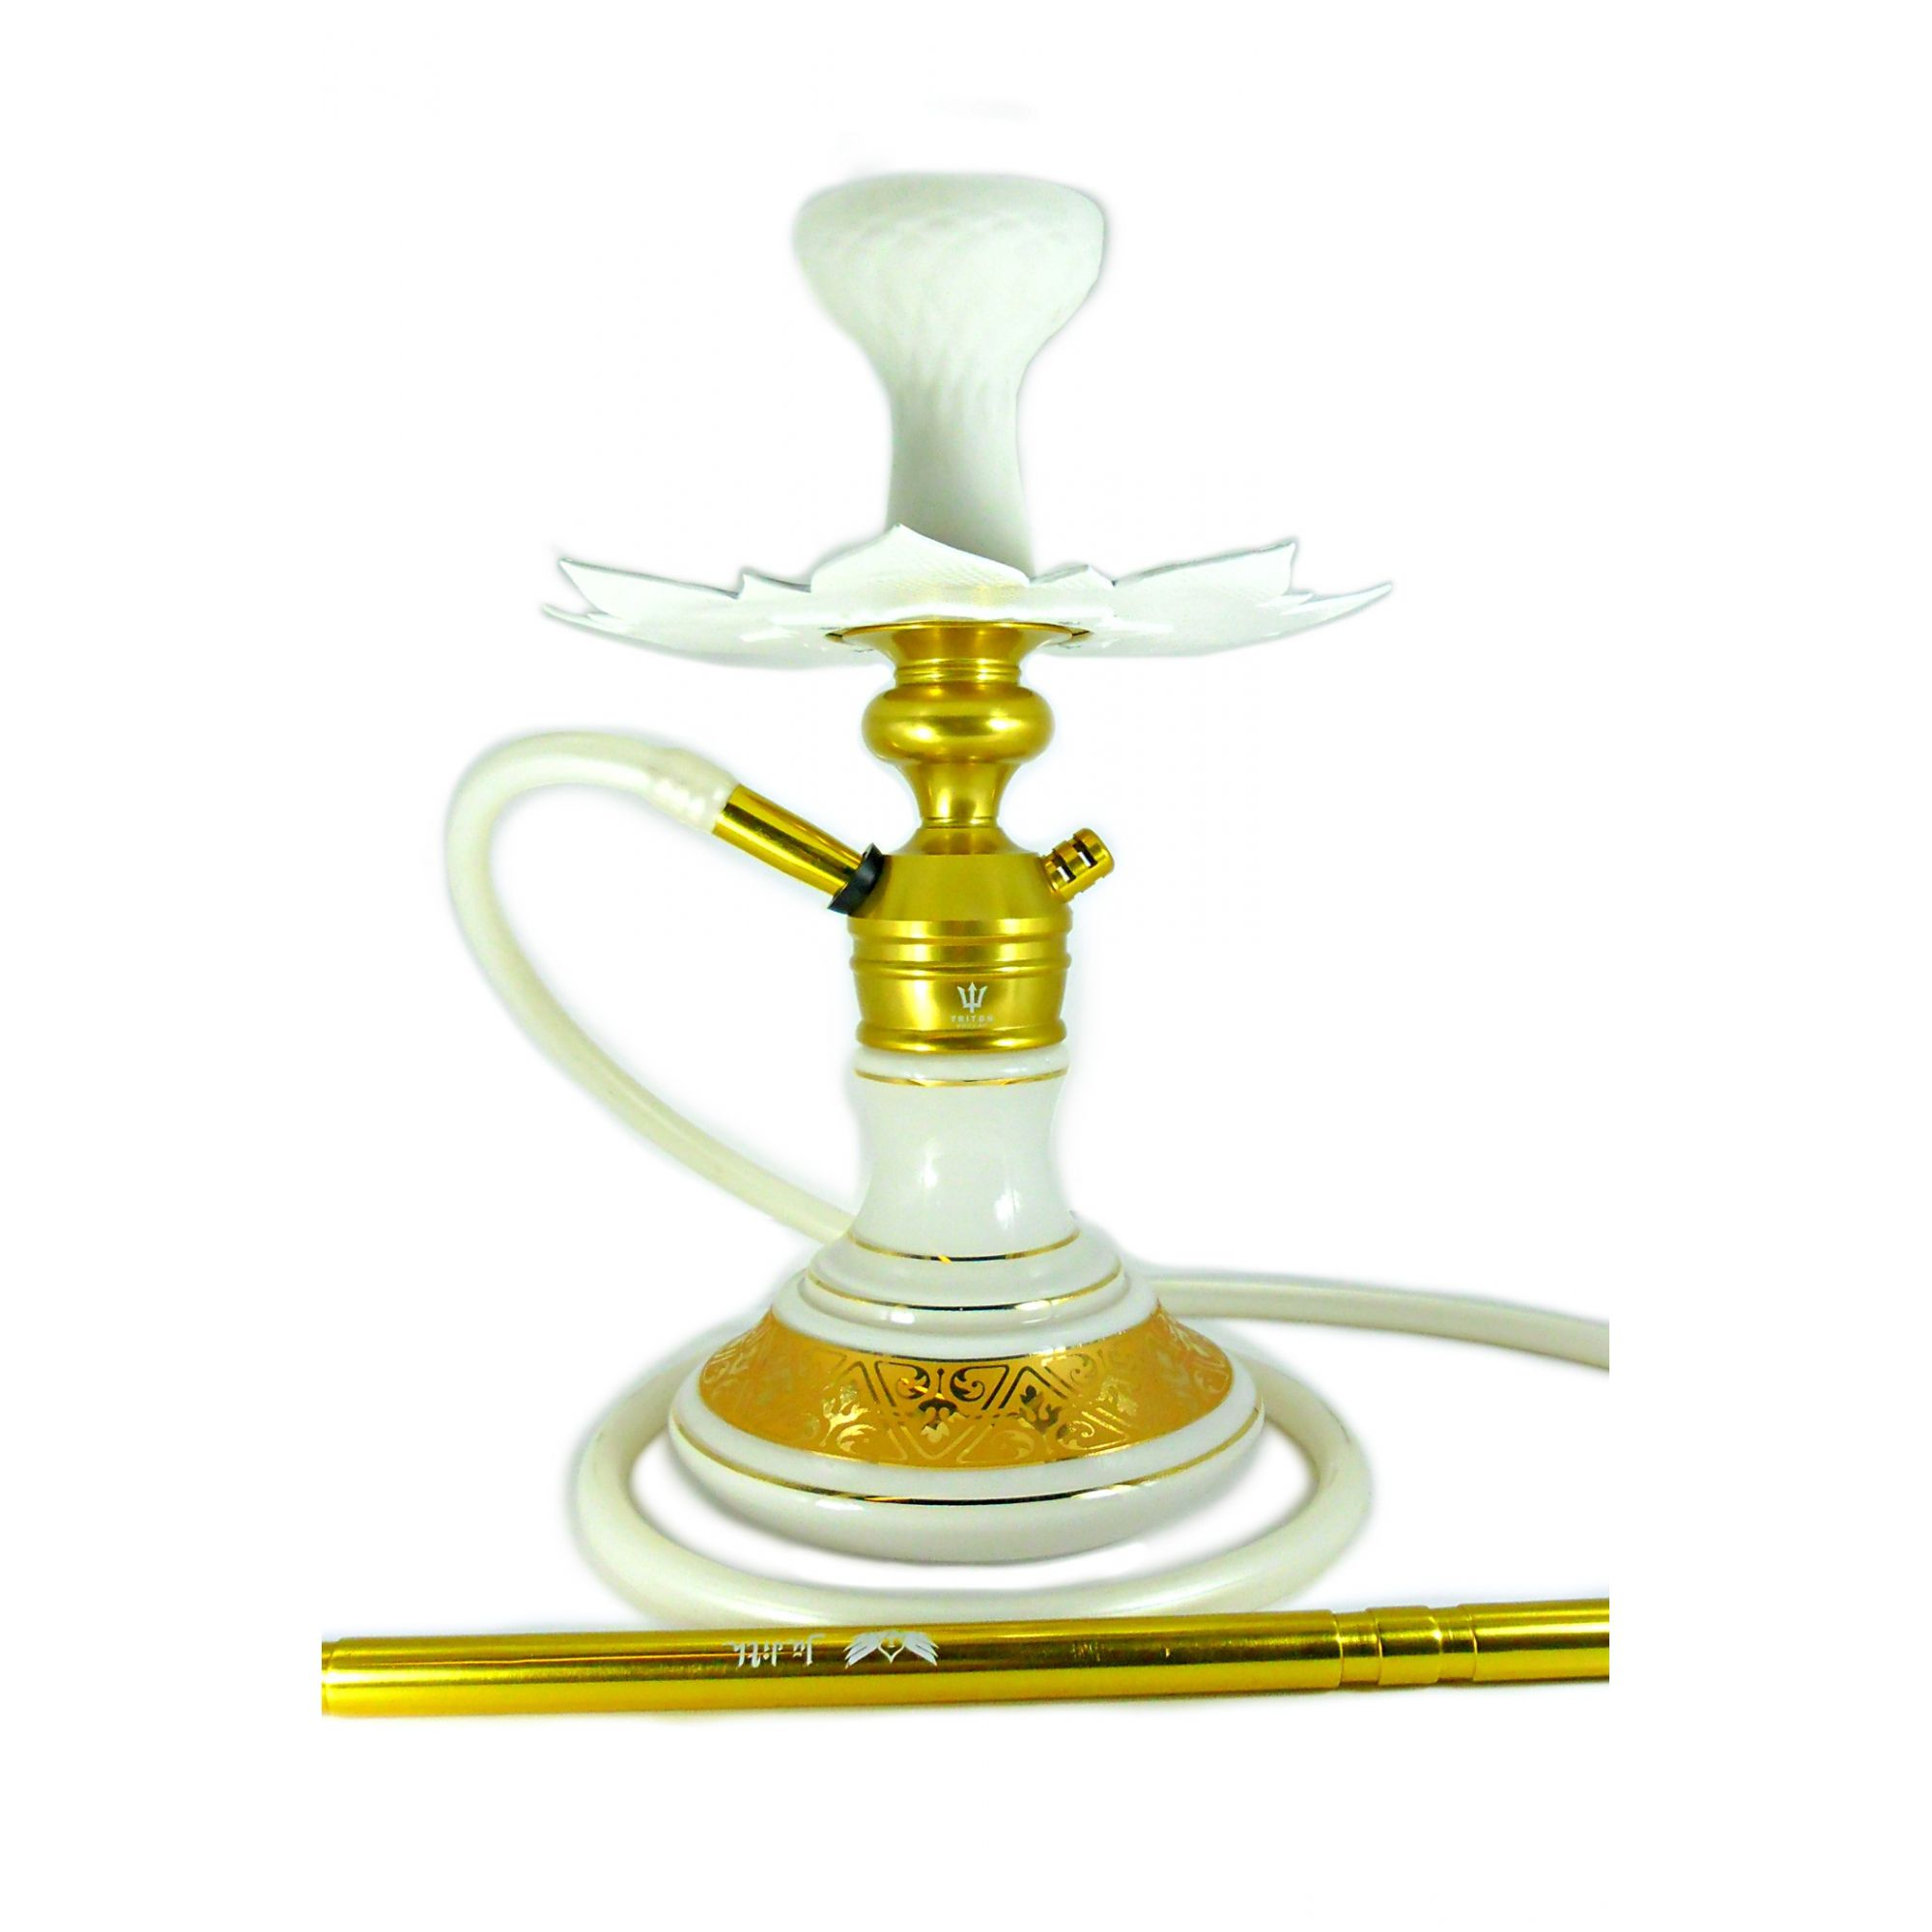 Narguile Triton Zip dourado, rosh silicone, vaso Aladin, mangueira silicone, piteira alumínio, prato Athenas.